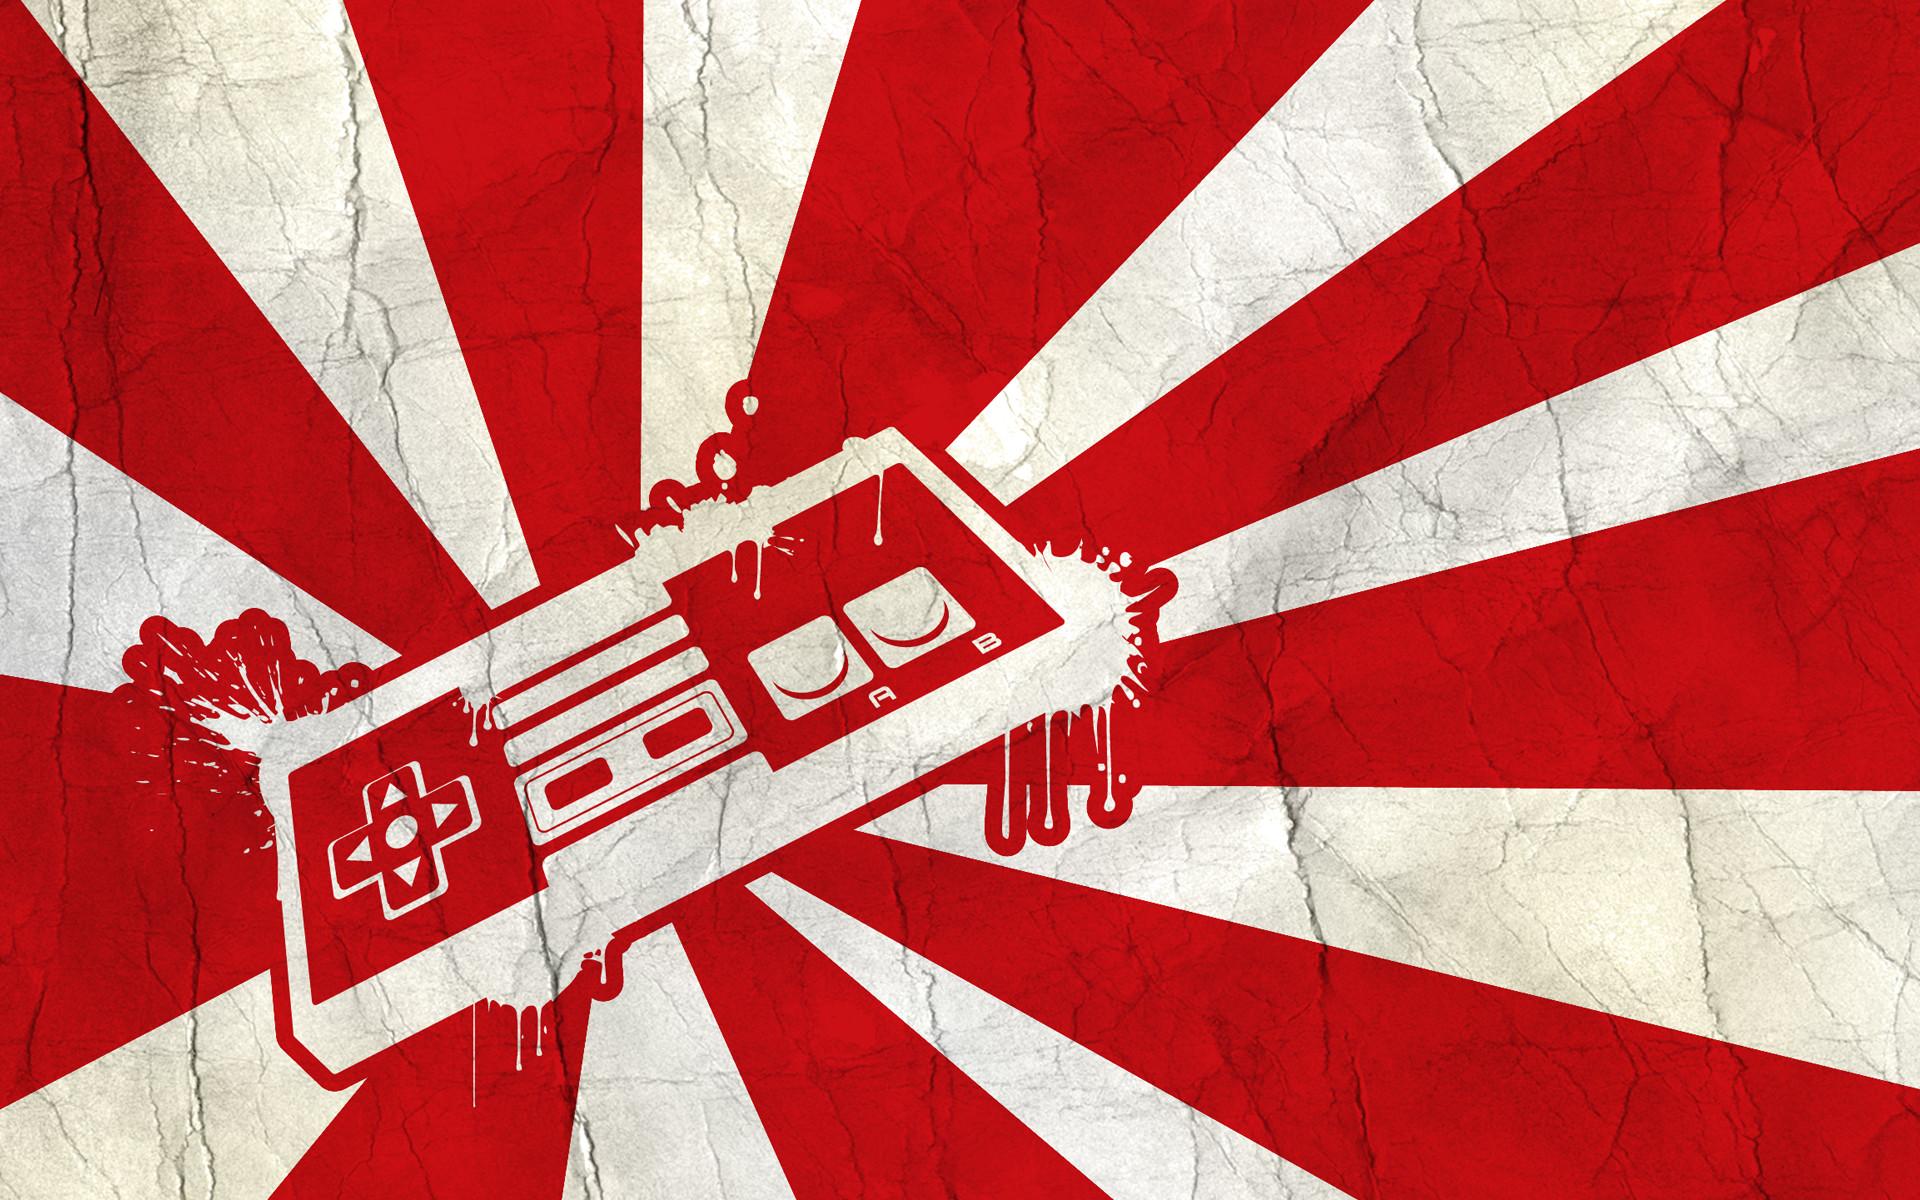 Nintendo Video Game Controller Wallpaper *Change Games Entertainment